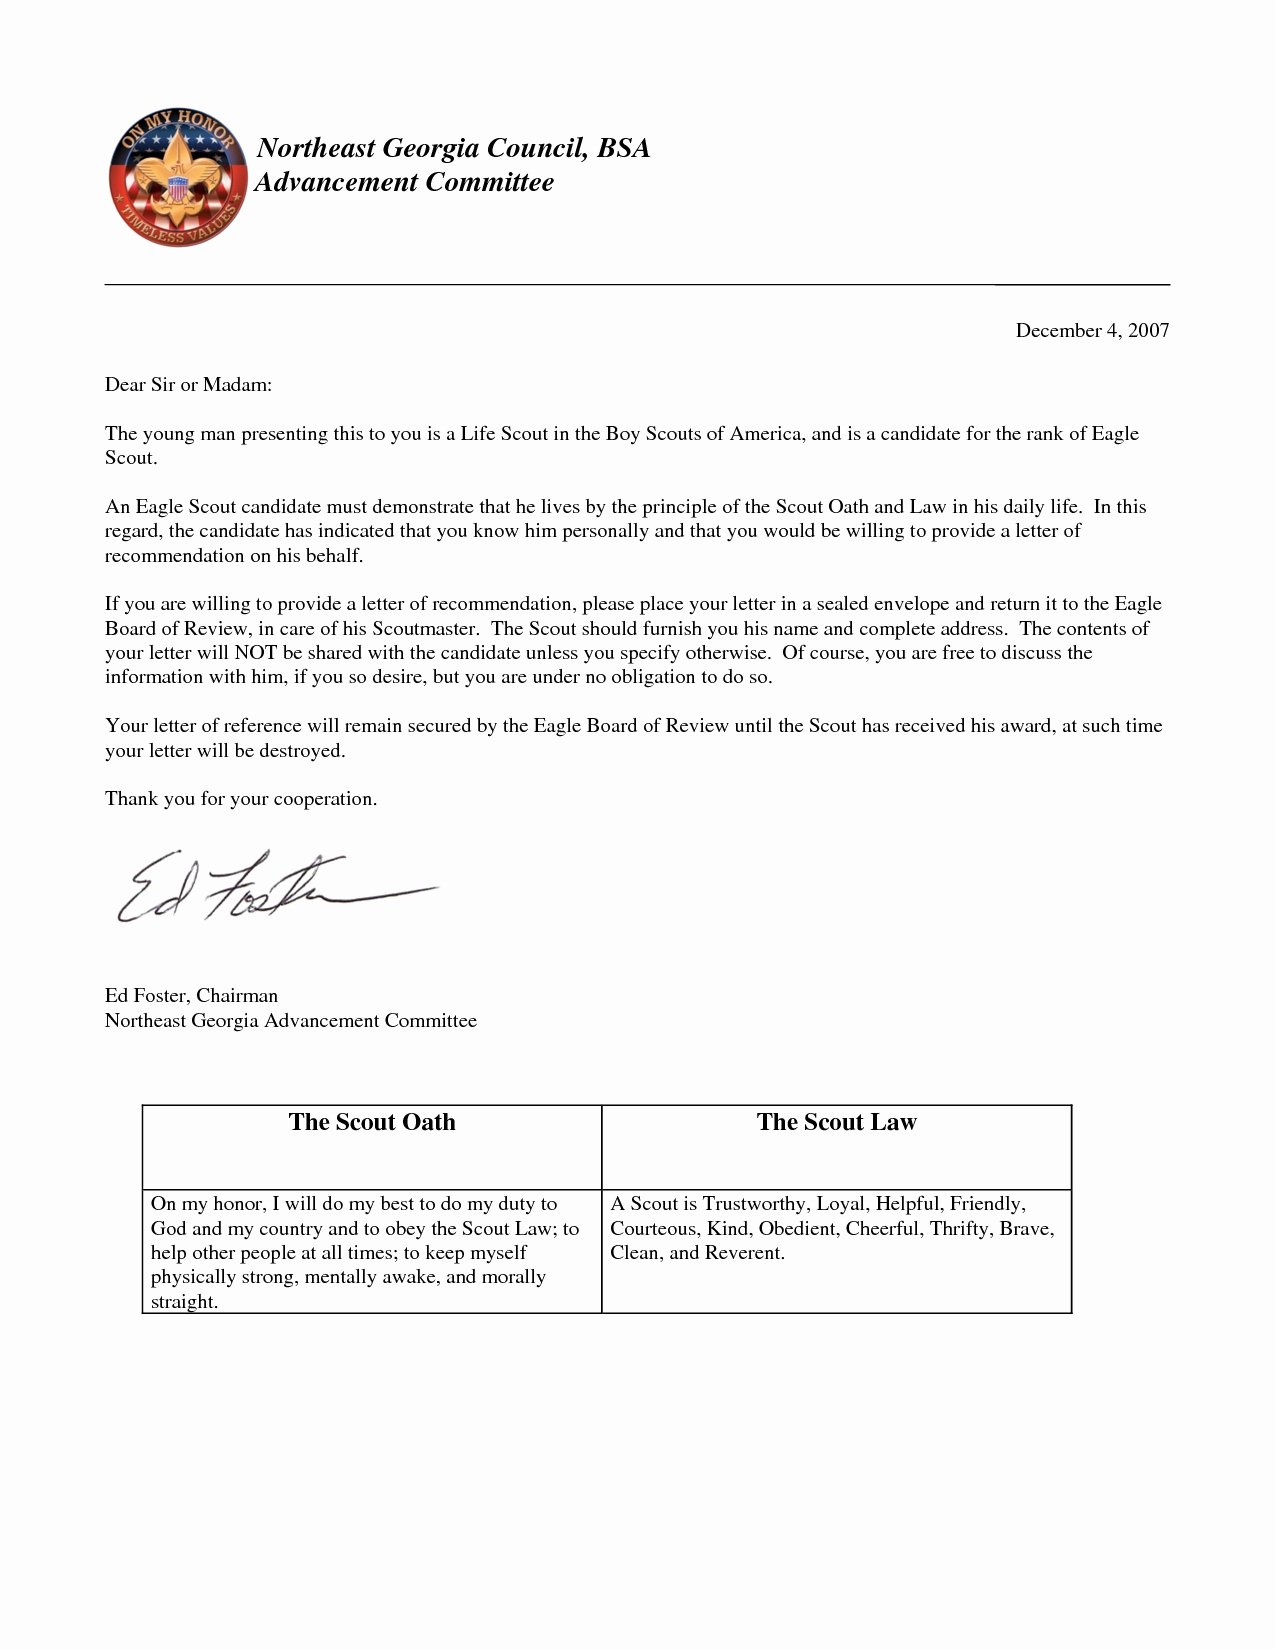 Sample Eagle Scout Recommendation Letter Best Of Eagle Scout Letter Re Mendation